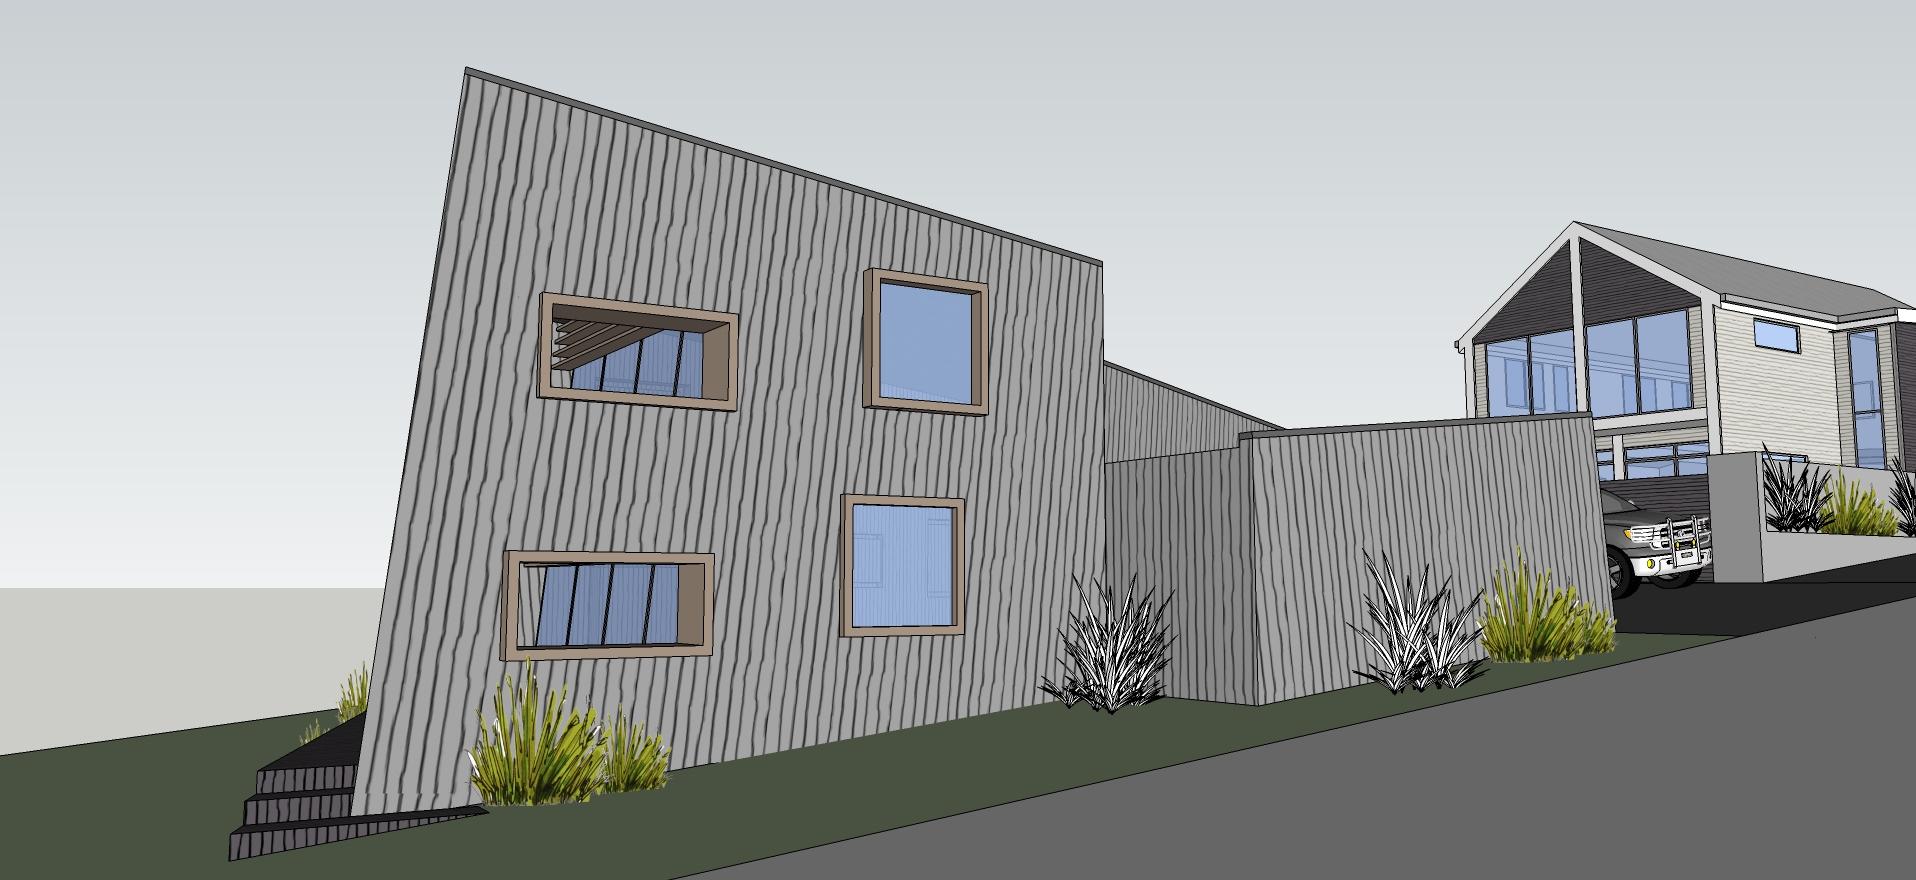 Driftwood-House-Concept-2.jpg